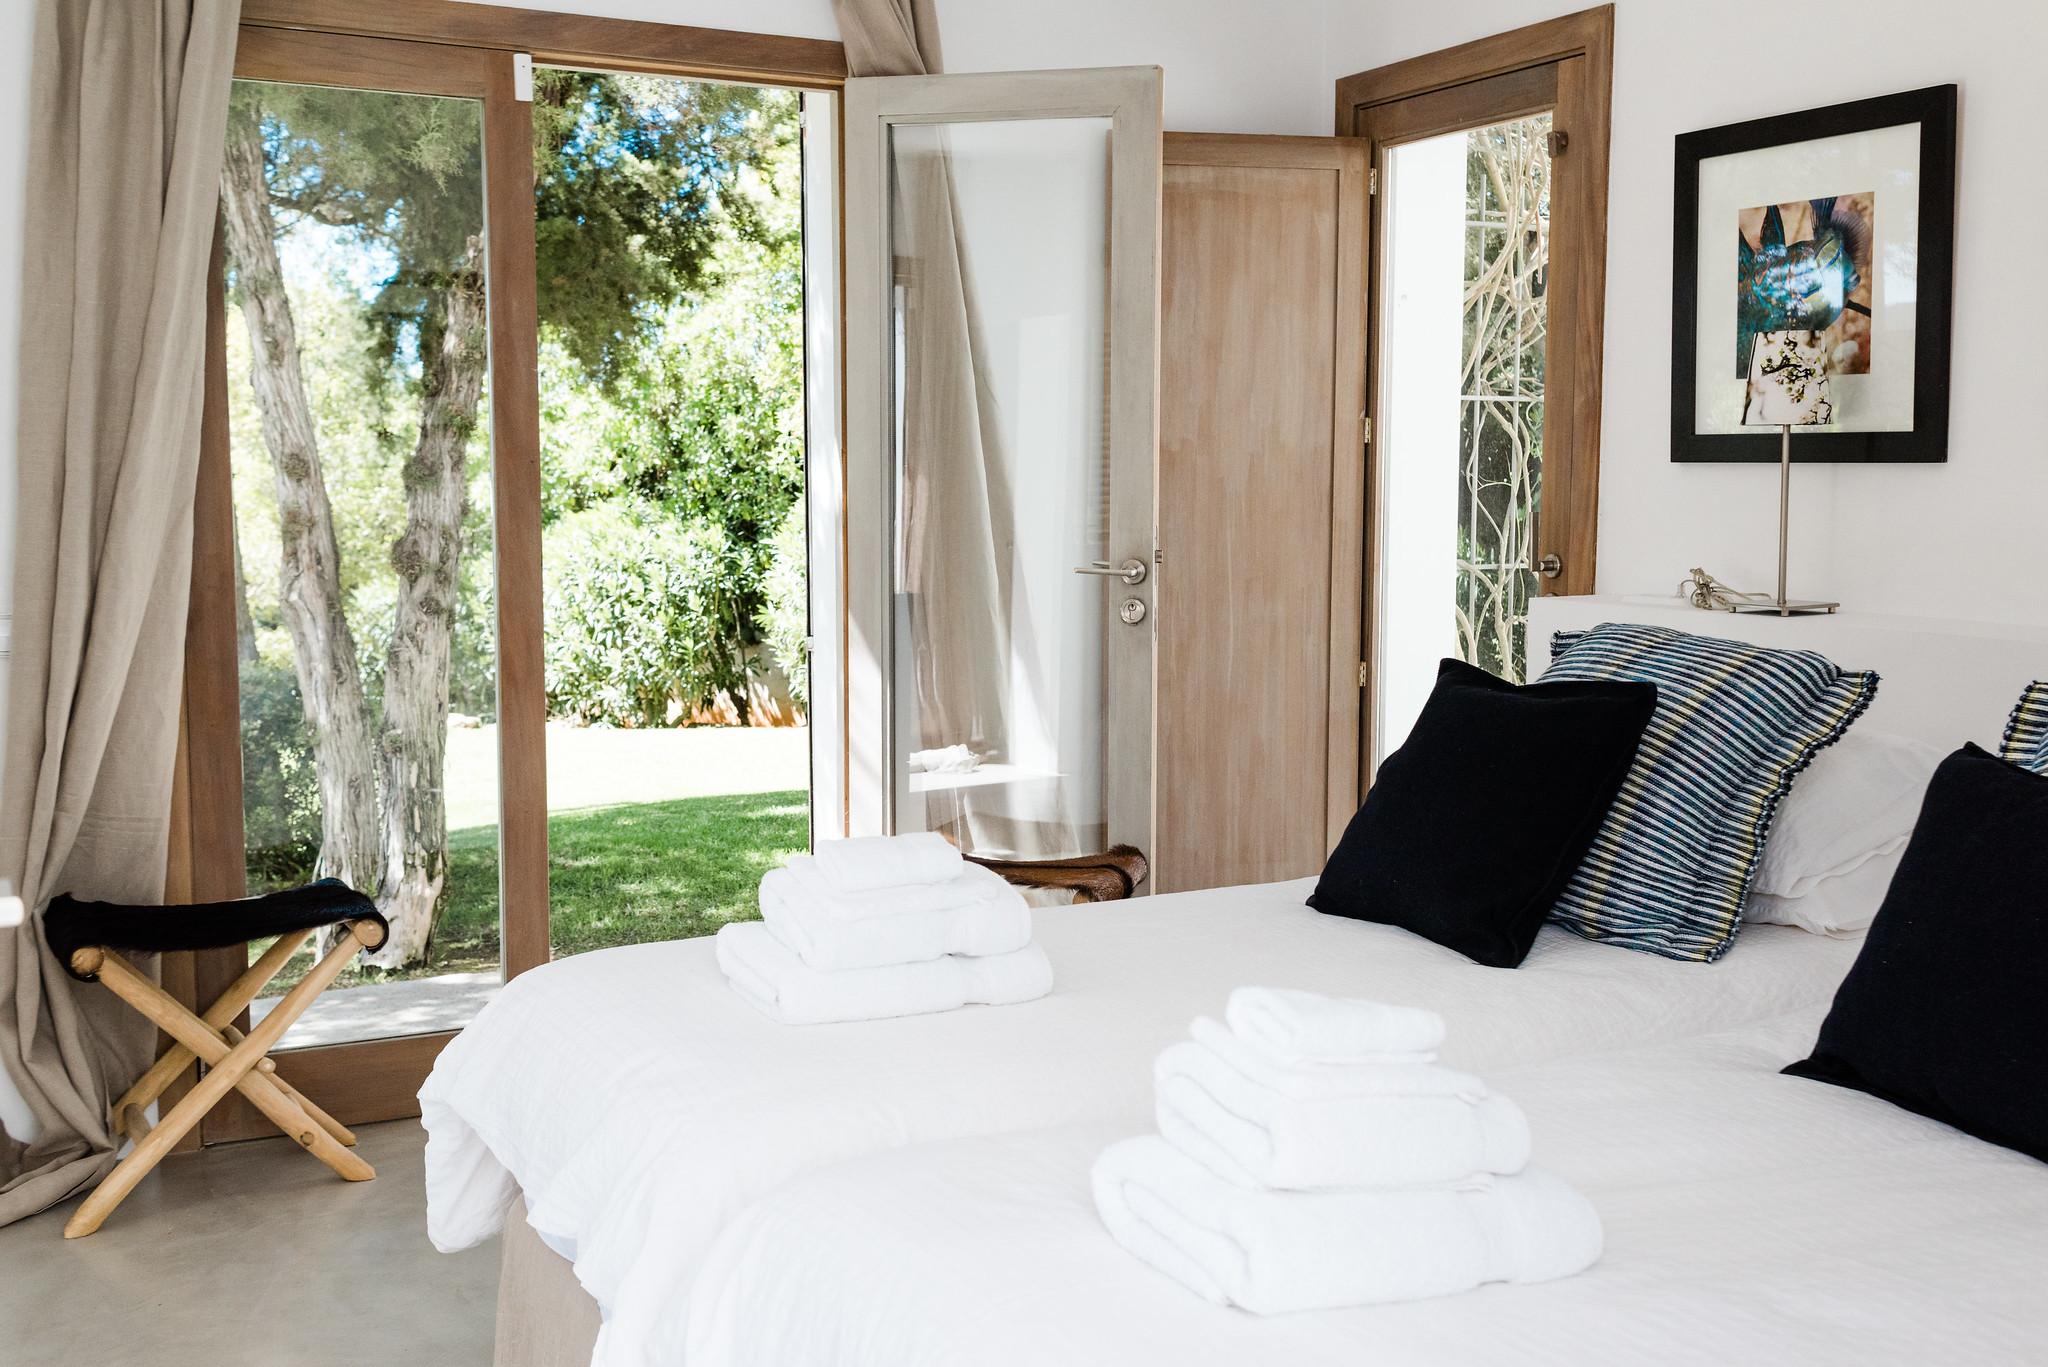 https://www.white-ibiza.com/wp-content/uploads/2020/06/white-ibiza-villas-casa-nyah-interior-bedroom8.jpg